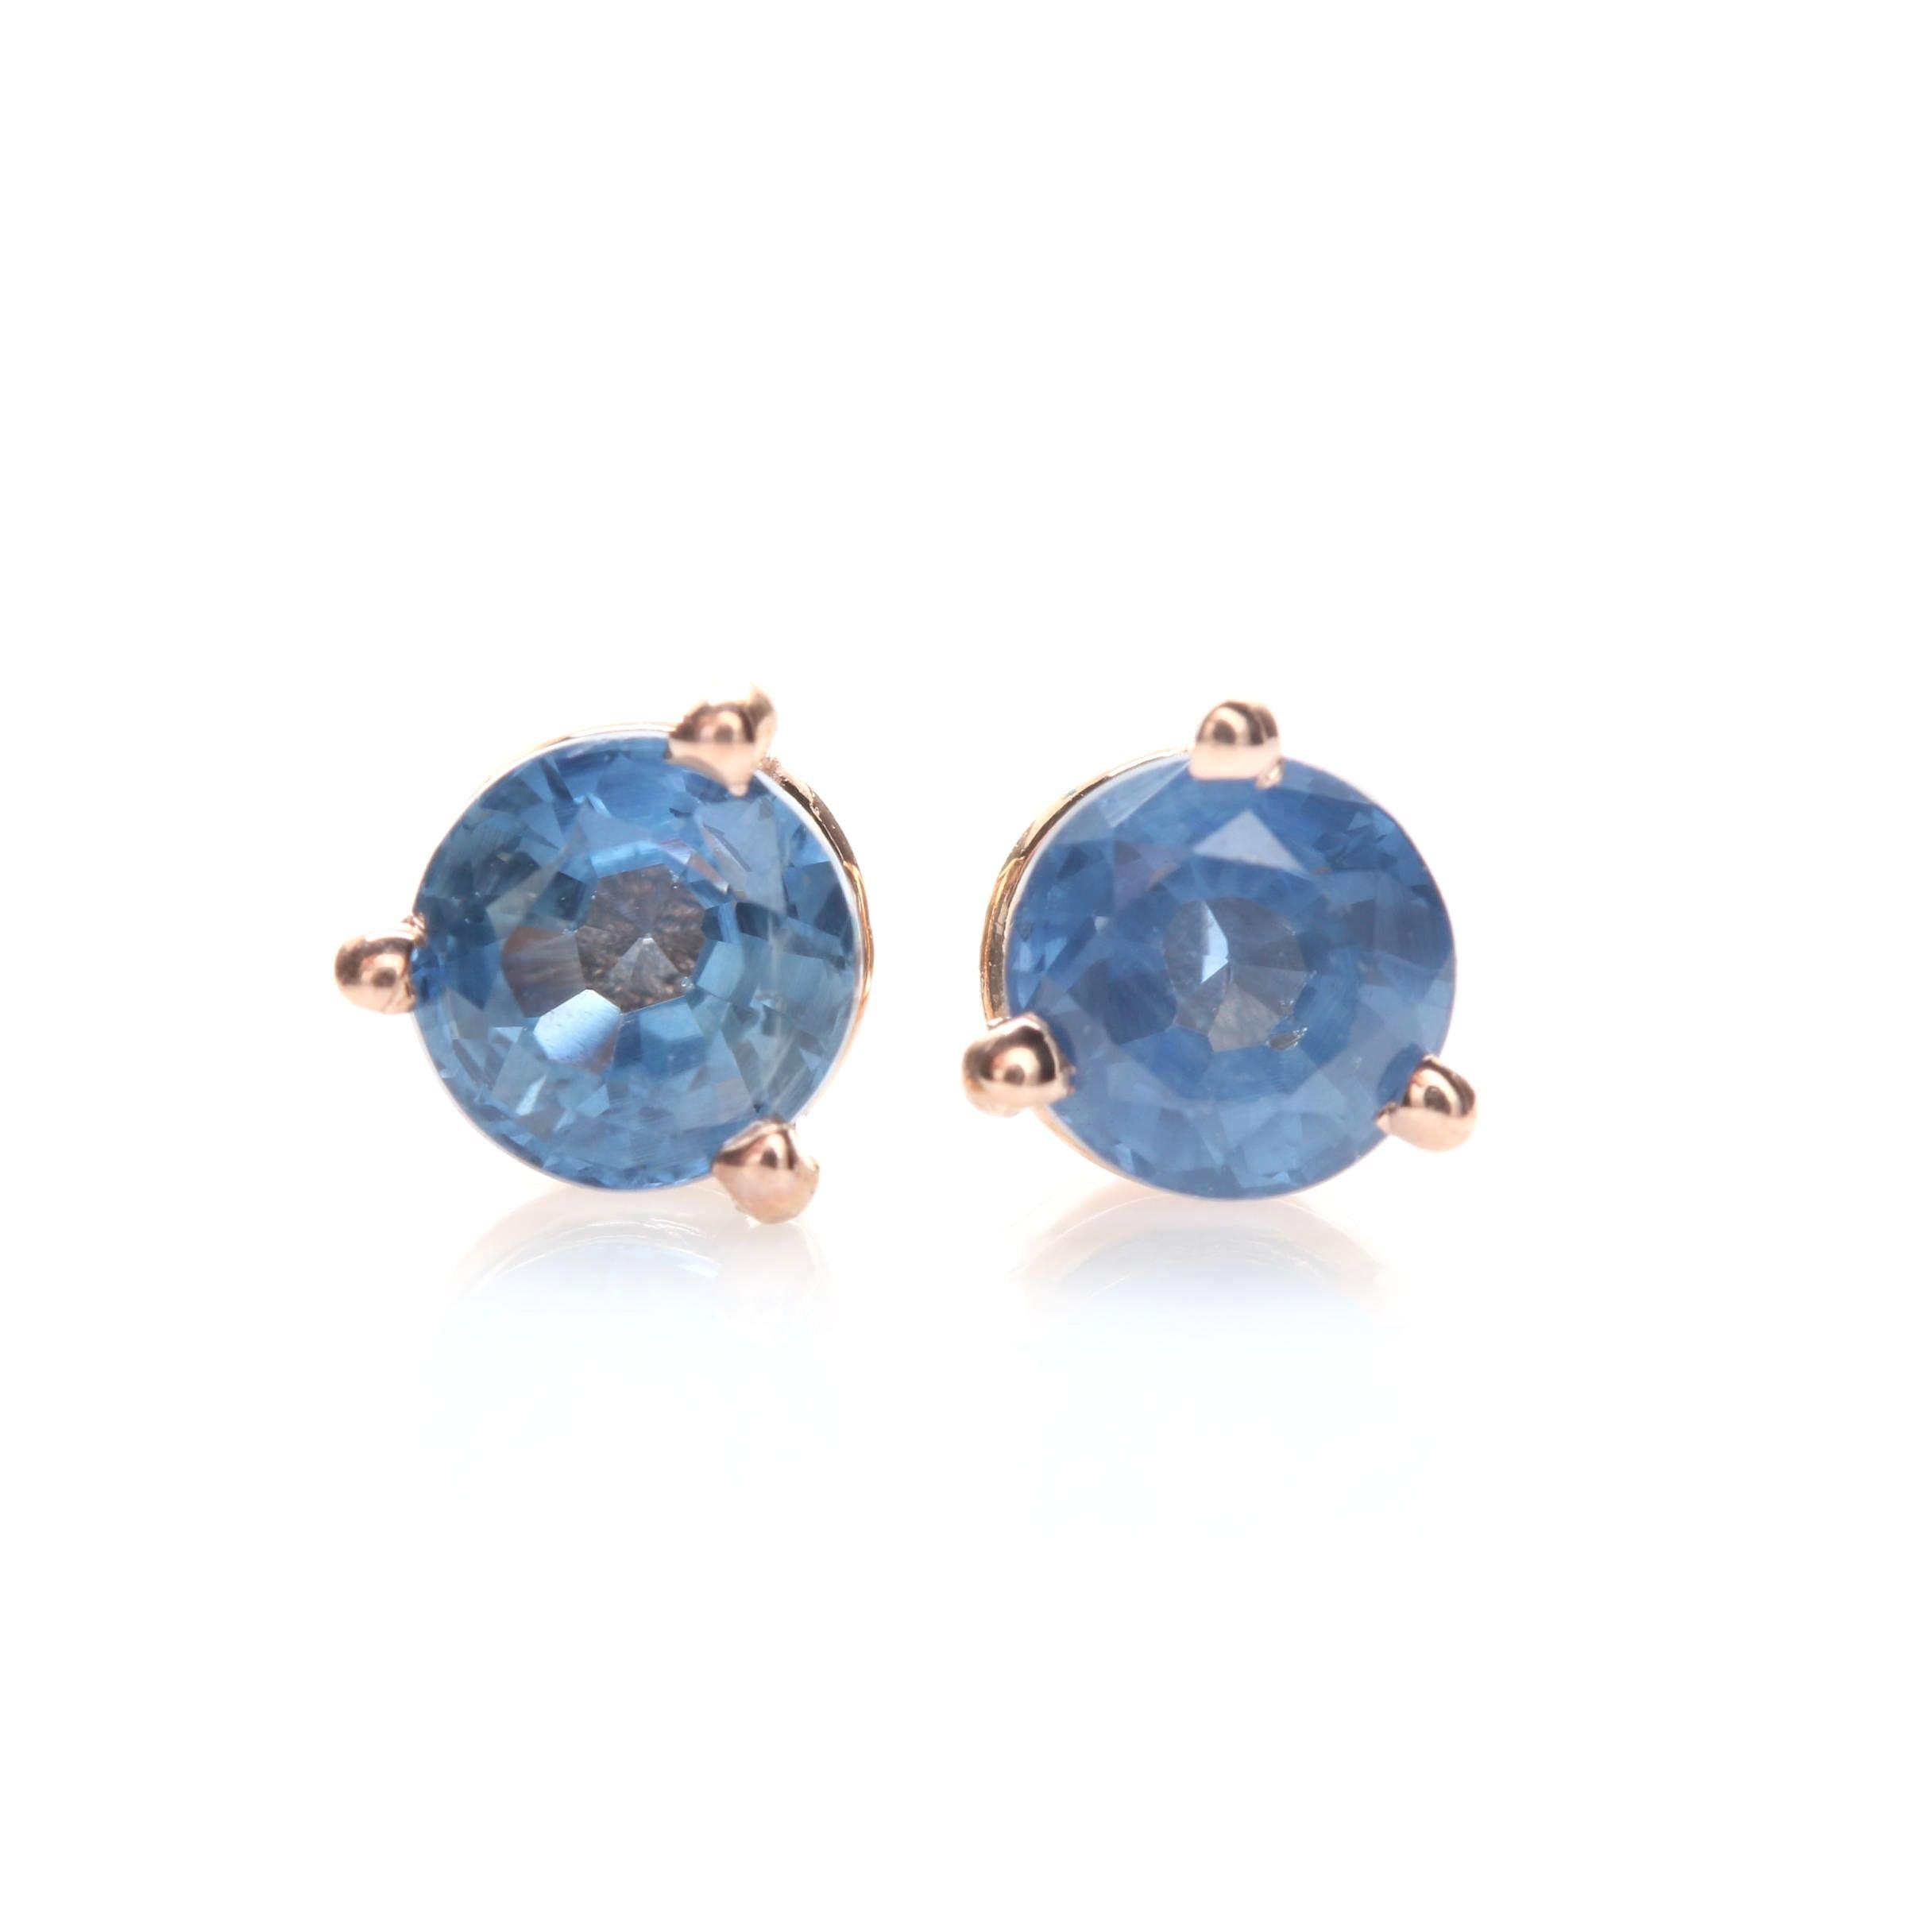 14K Rose Gold Blue Sapphire Stud Earrings